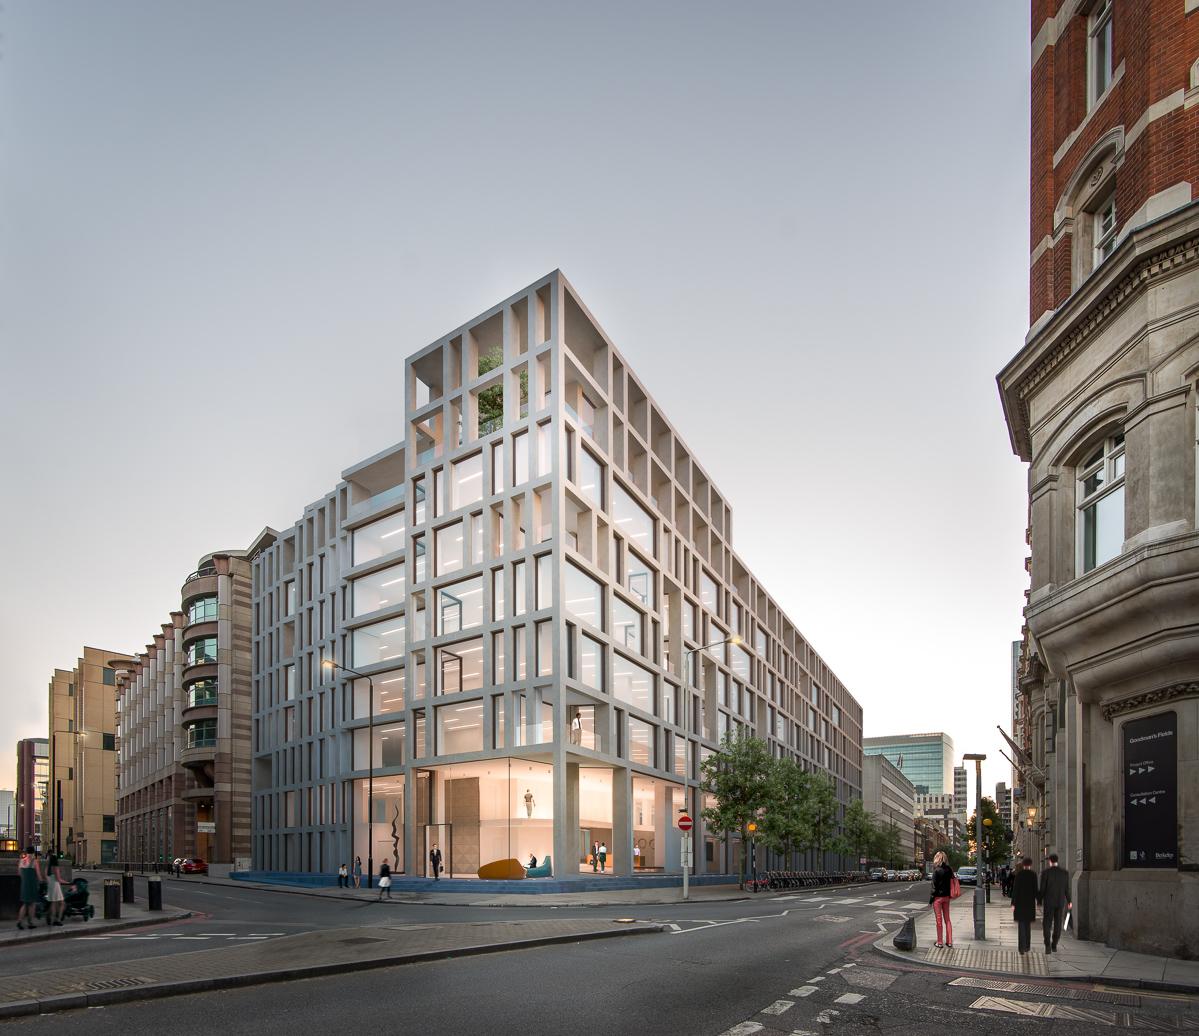 London architectural services addresses list of architects for List of architects